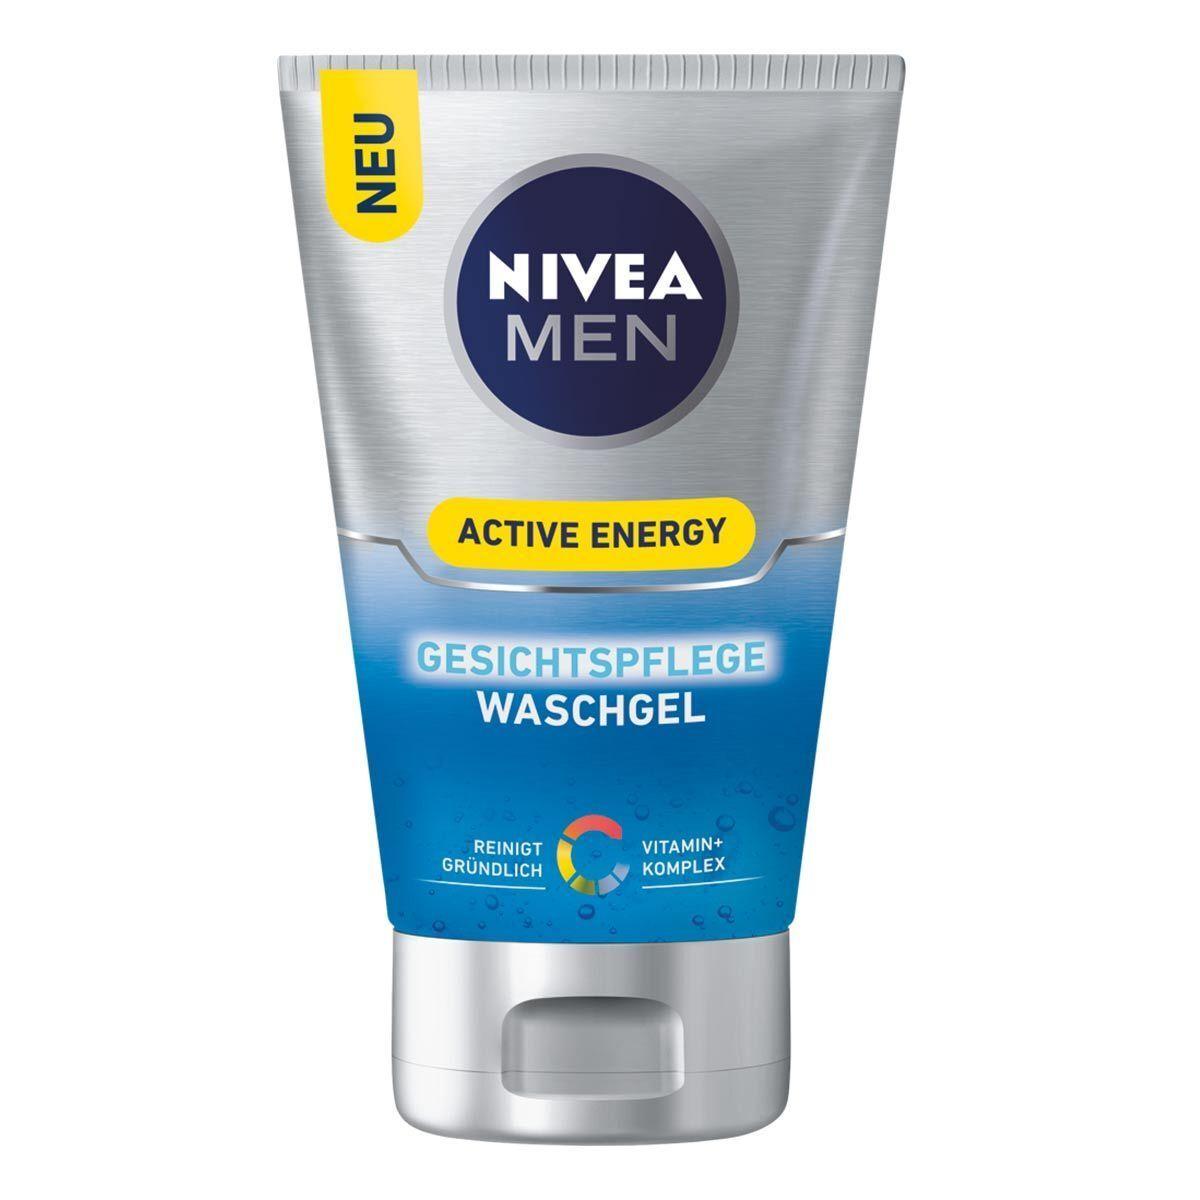 Nivea - Active Energy Face Wash